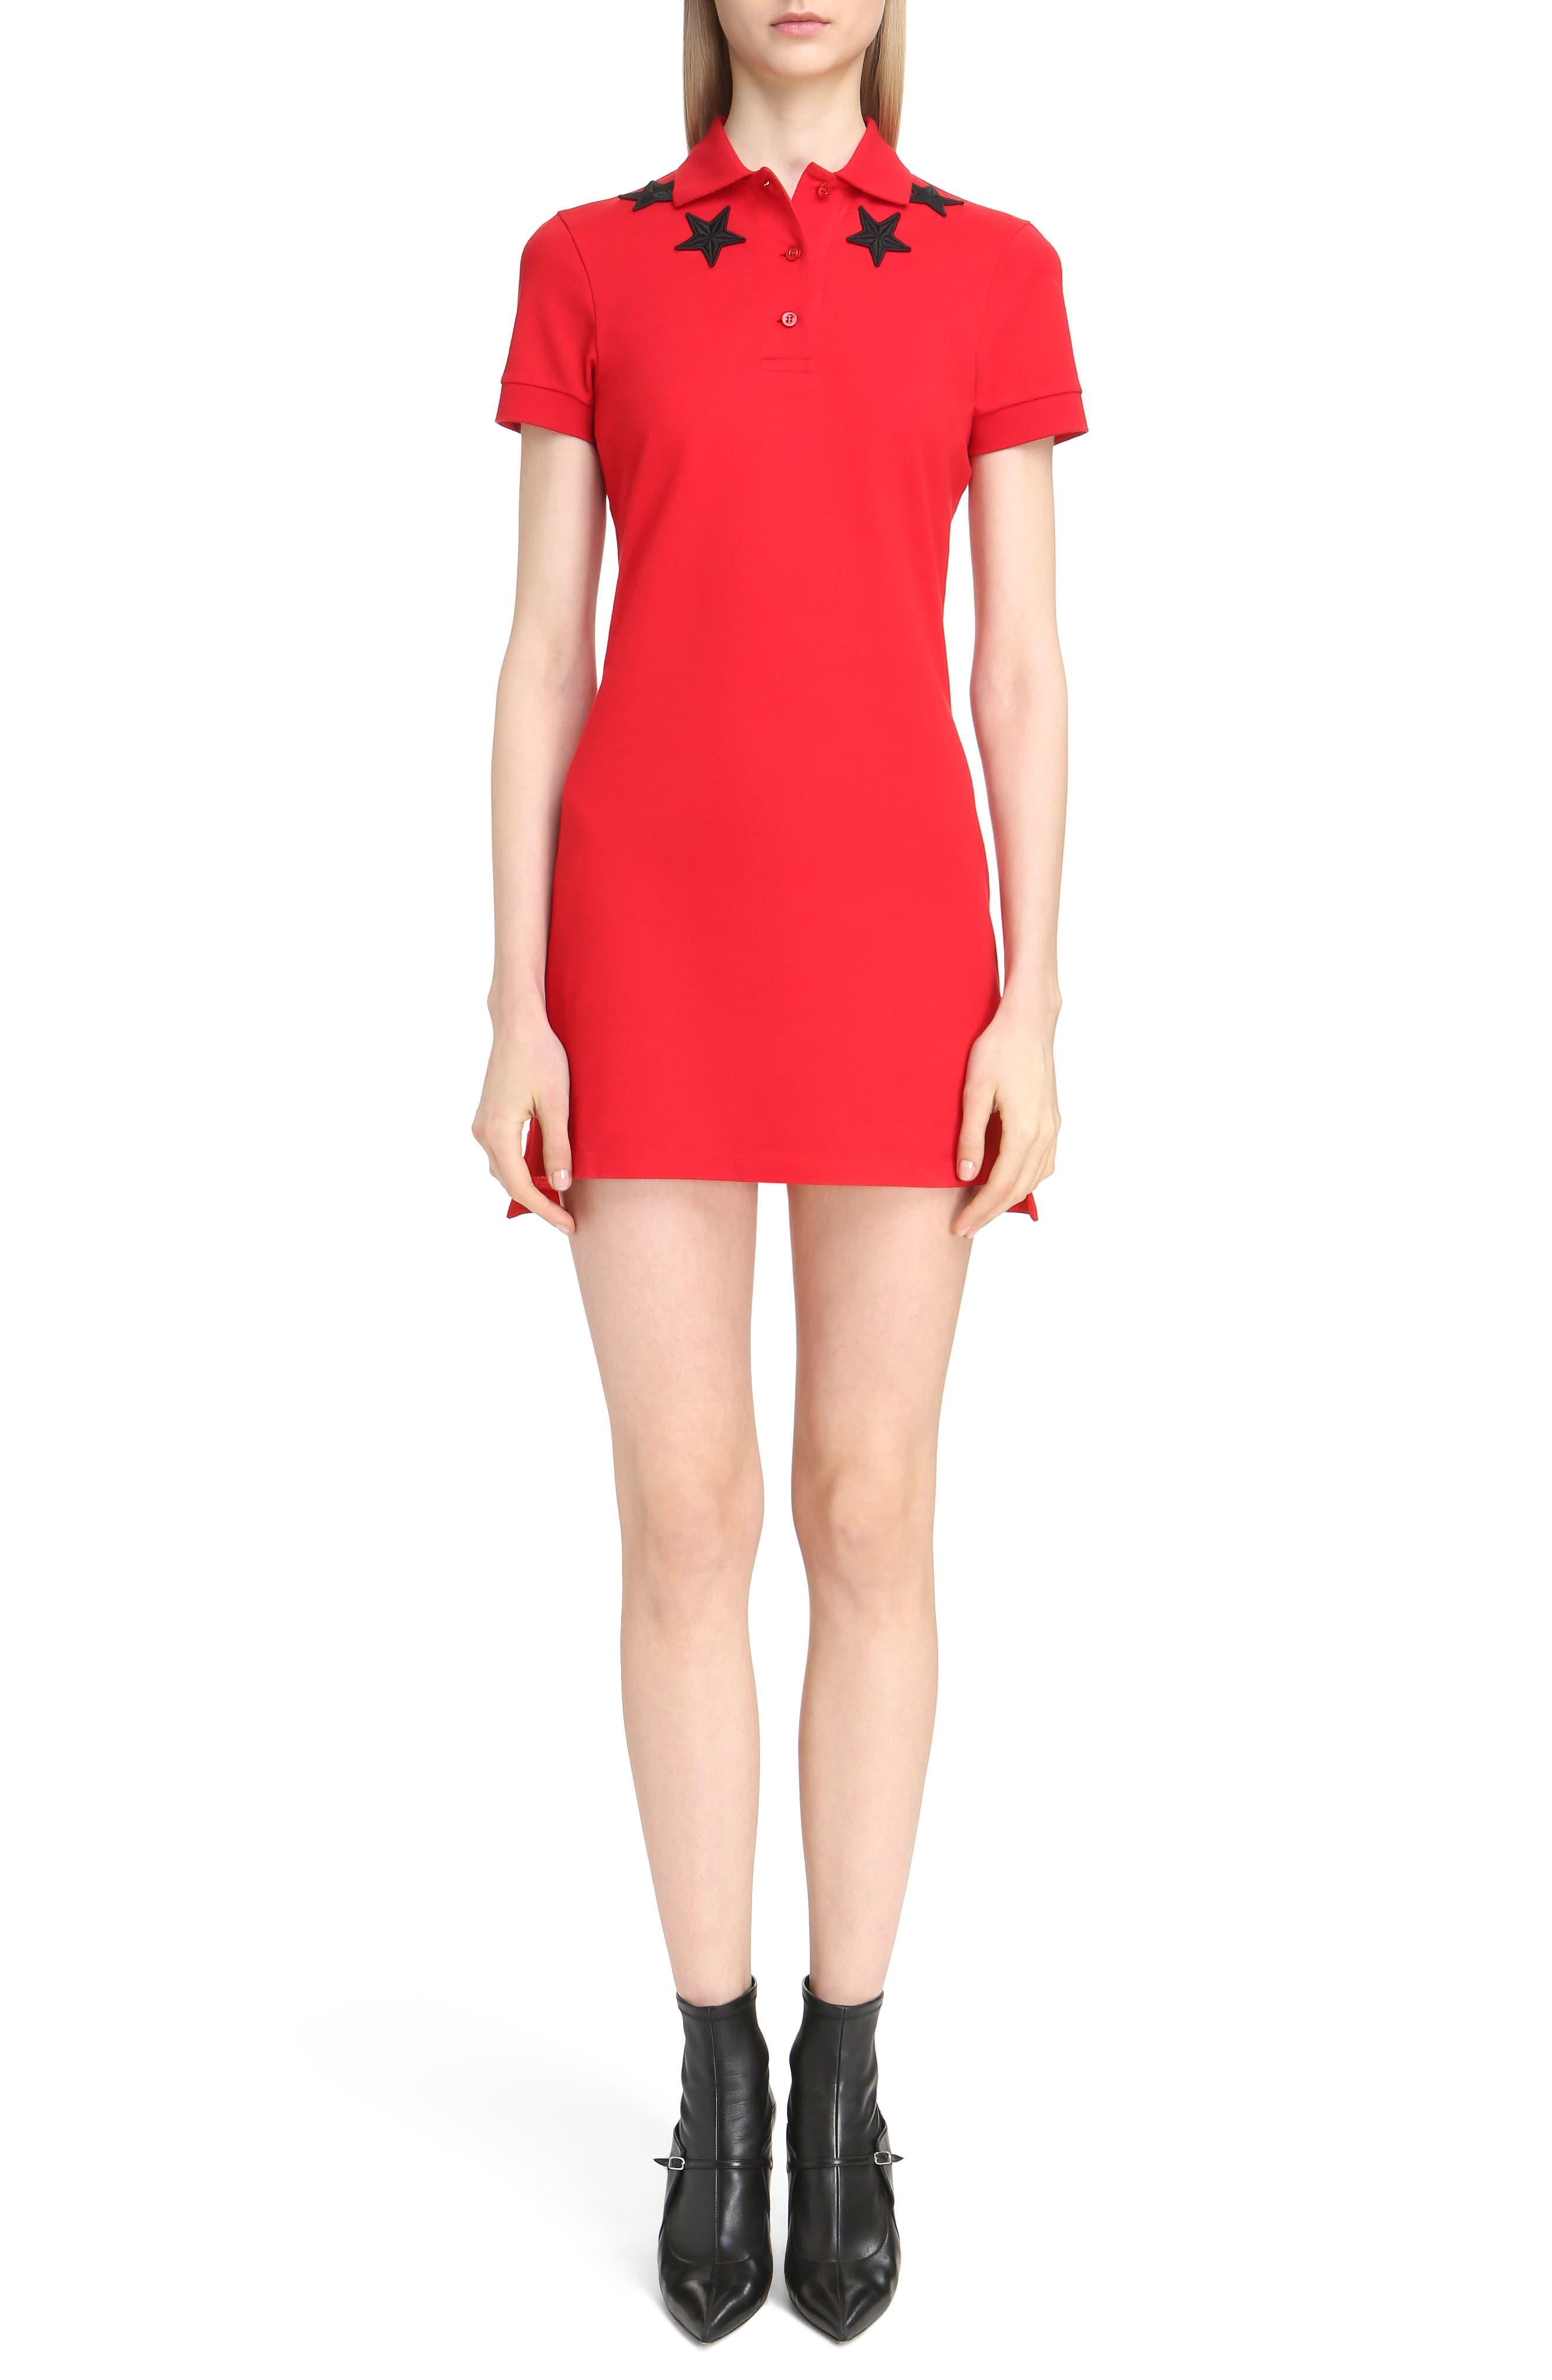 Star Embellished Polo Dress,                         Main,                         color, 606